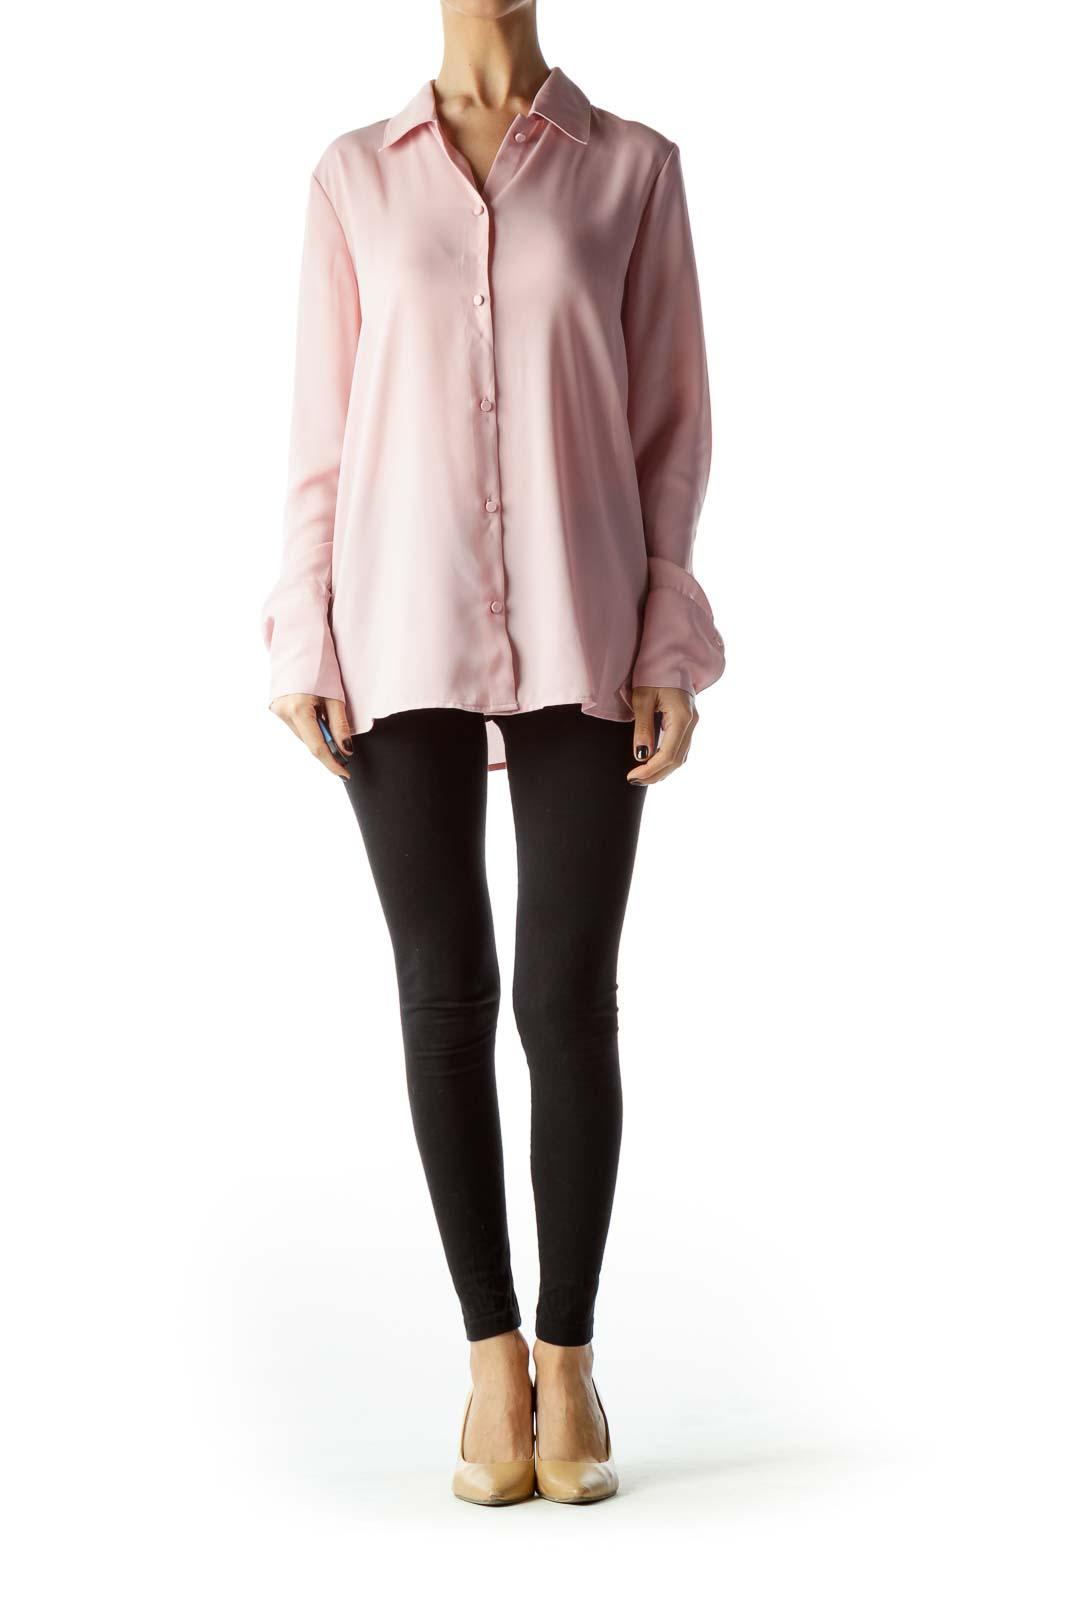 Baby Pink Light Shirt